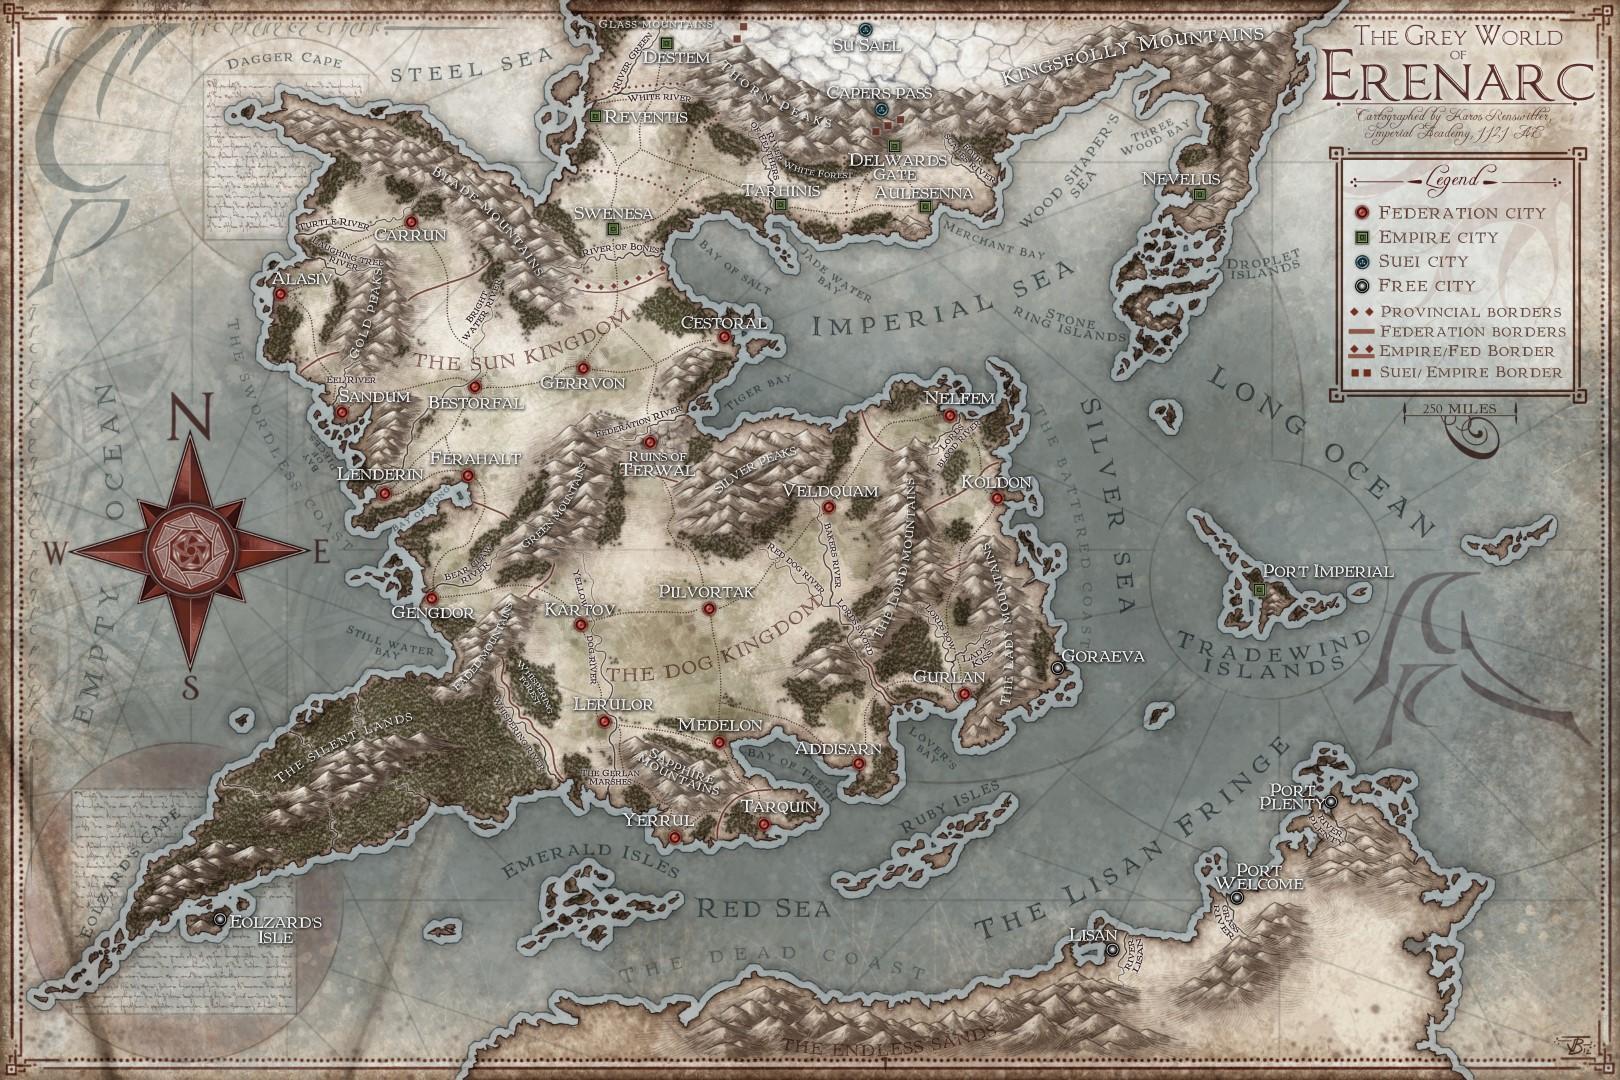 The Grey World of Erenarc